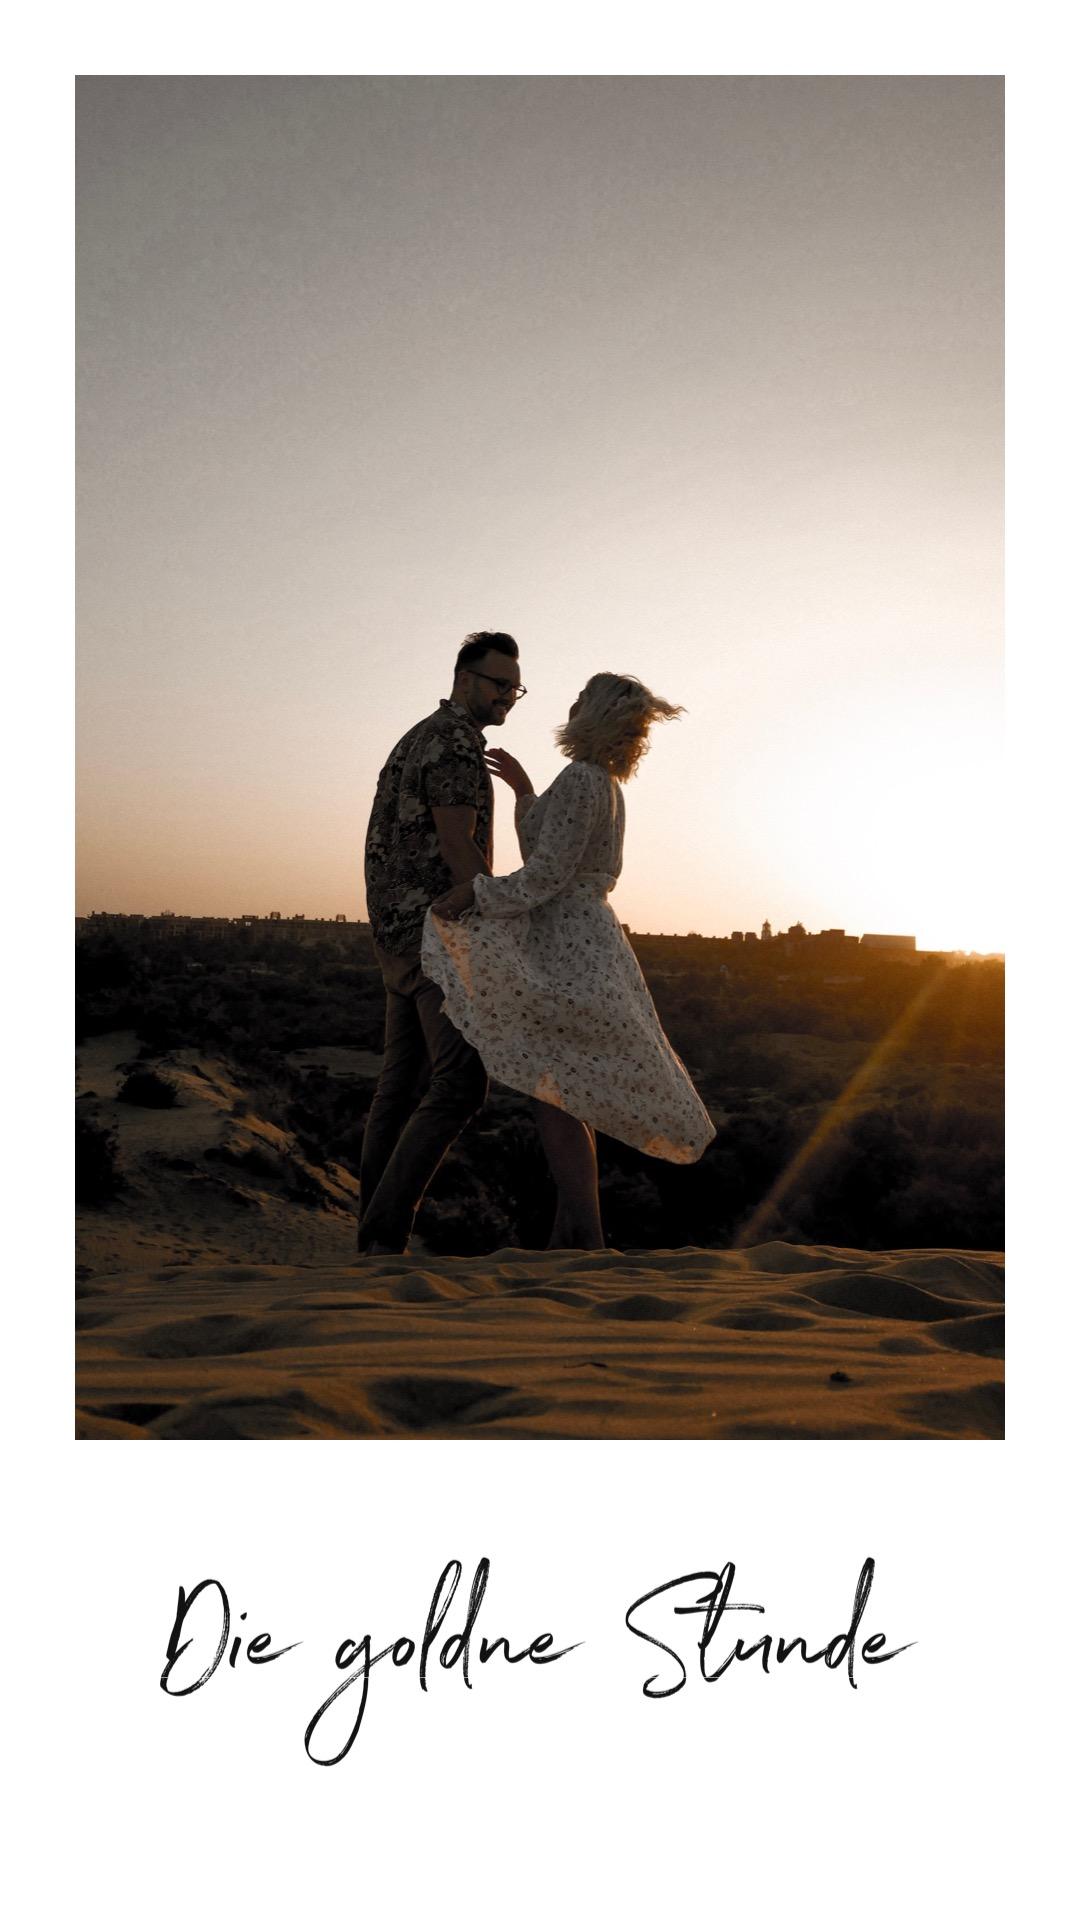 happyking-agency-social-media-marketing-agentur-koeln-cologne-fotografie-licht-goldenestunde